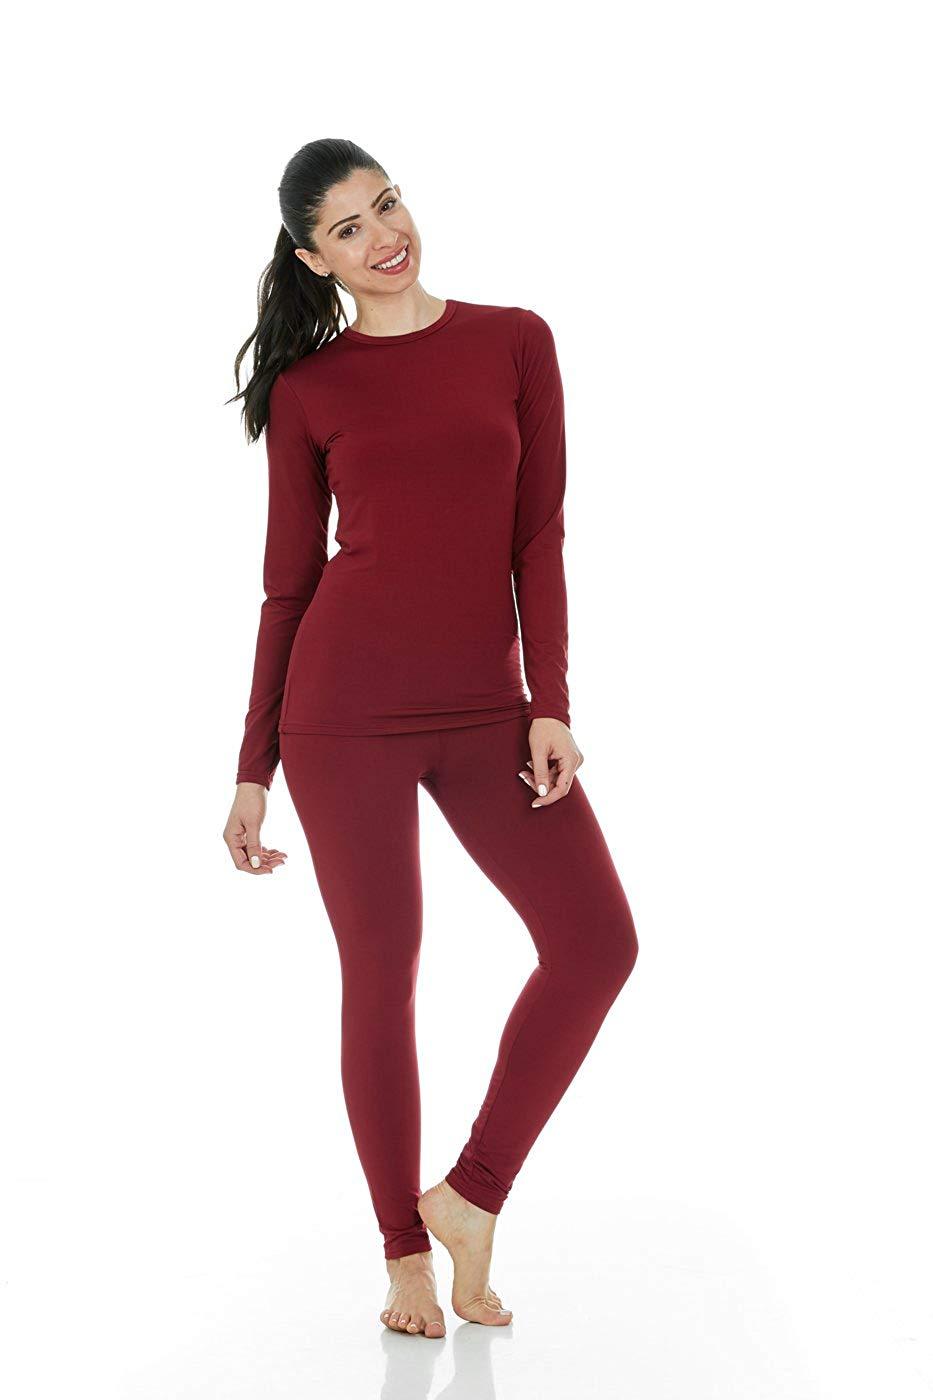 Women Soft Thermal Underwear Long Johns   Set   Fleece Autumn Winter Fleece Warm 2 Pieces Long Johns Large Slim Soft   Pajama     set